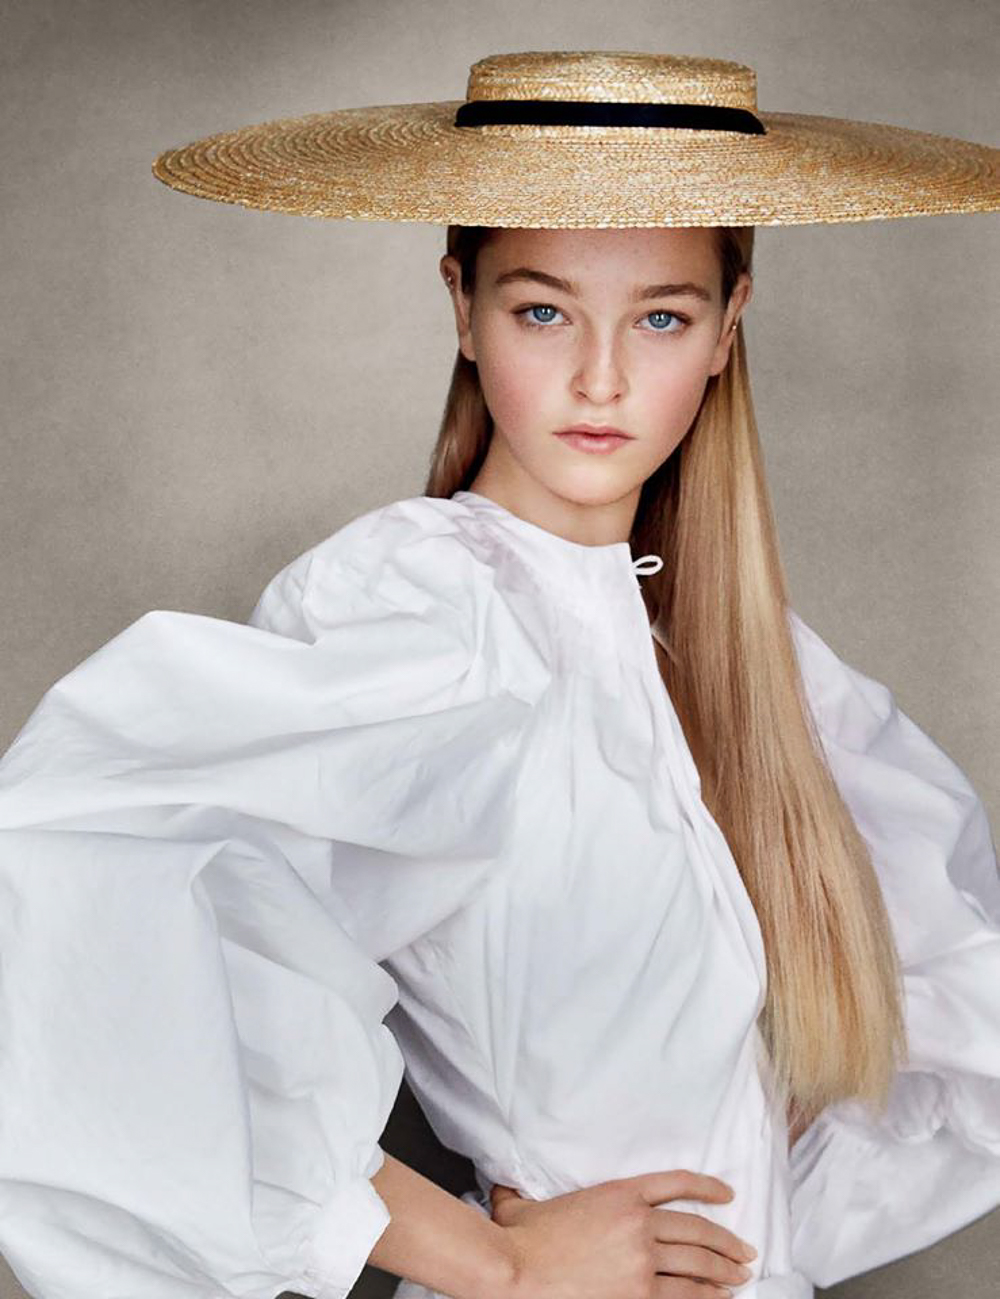 Vogue Germany March 2017 - Patrick Demarchelier